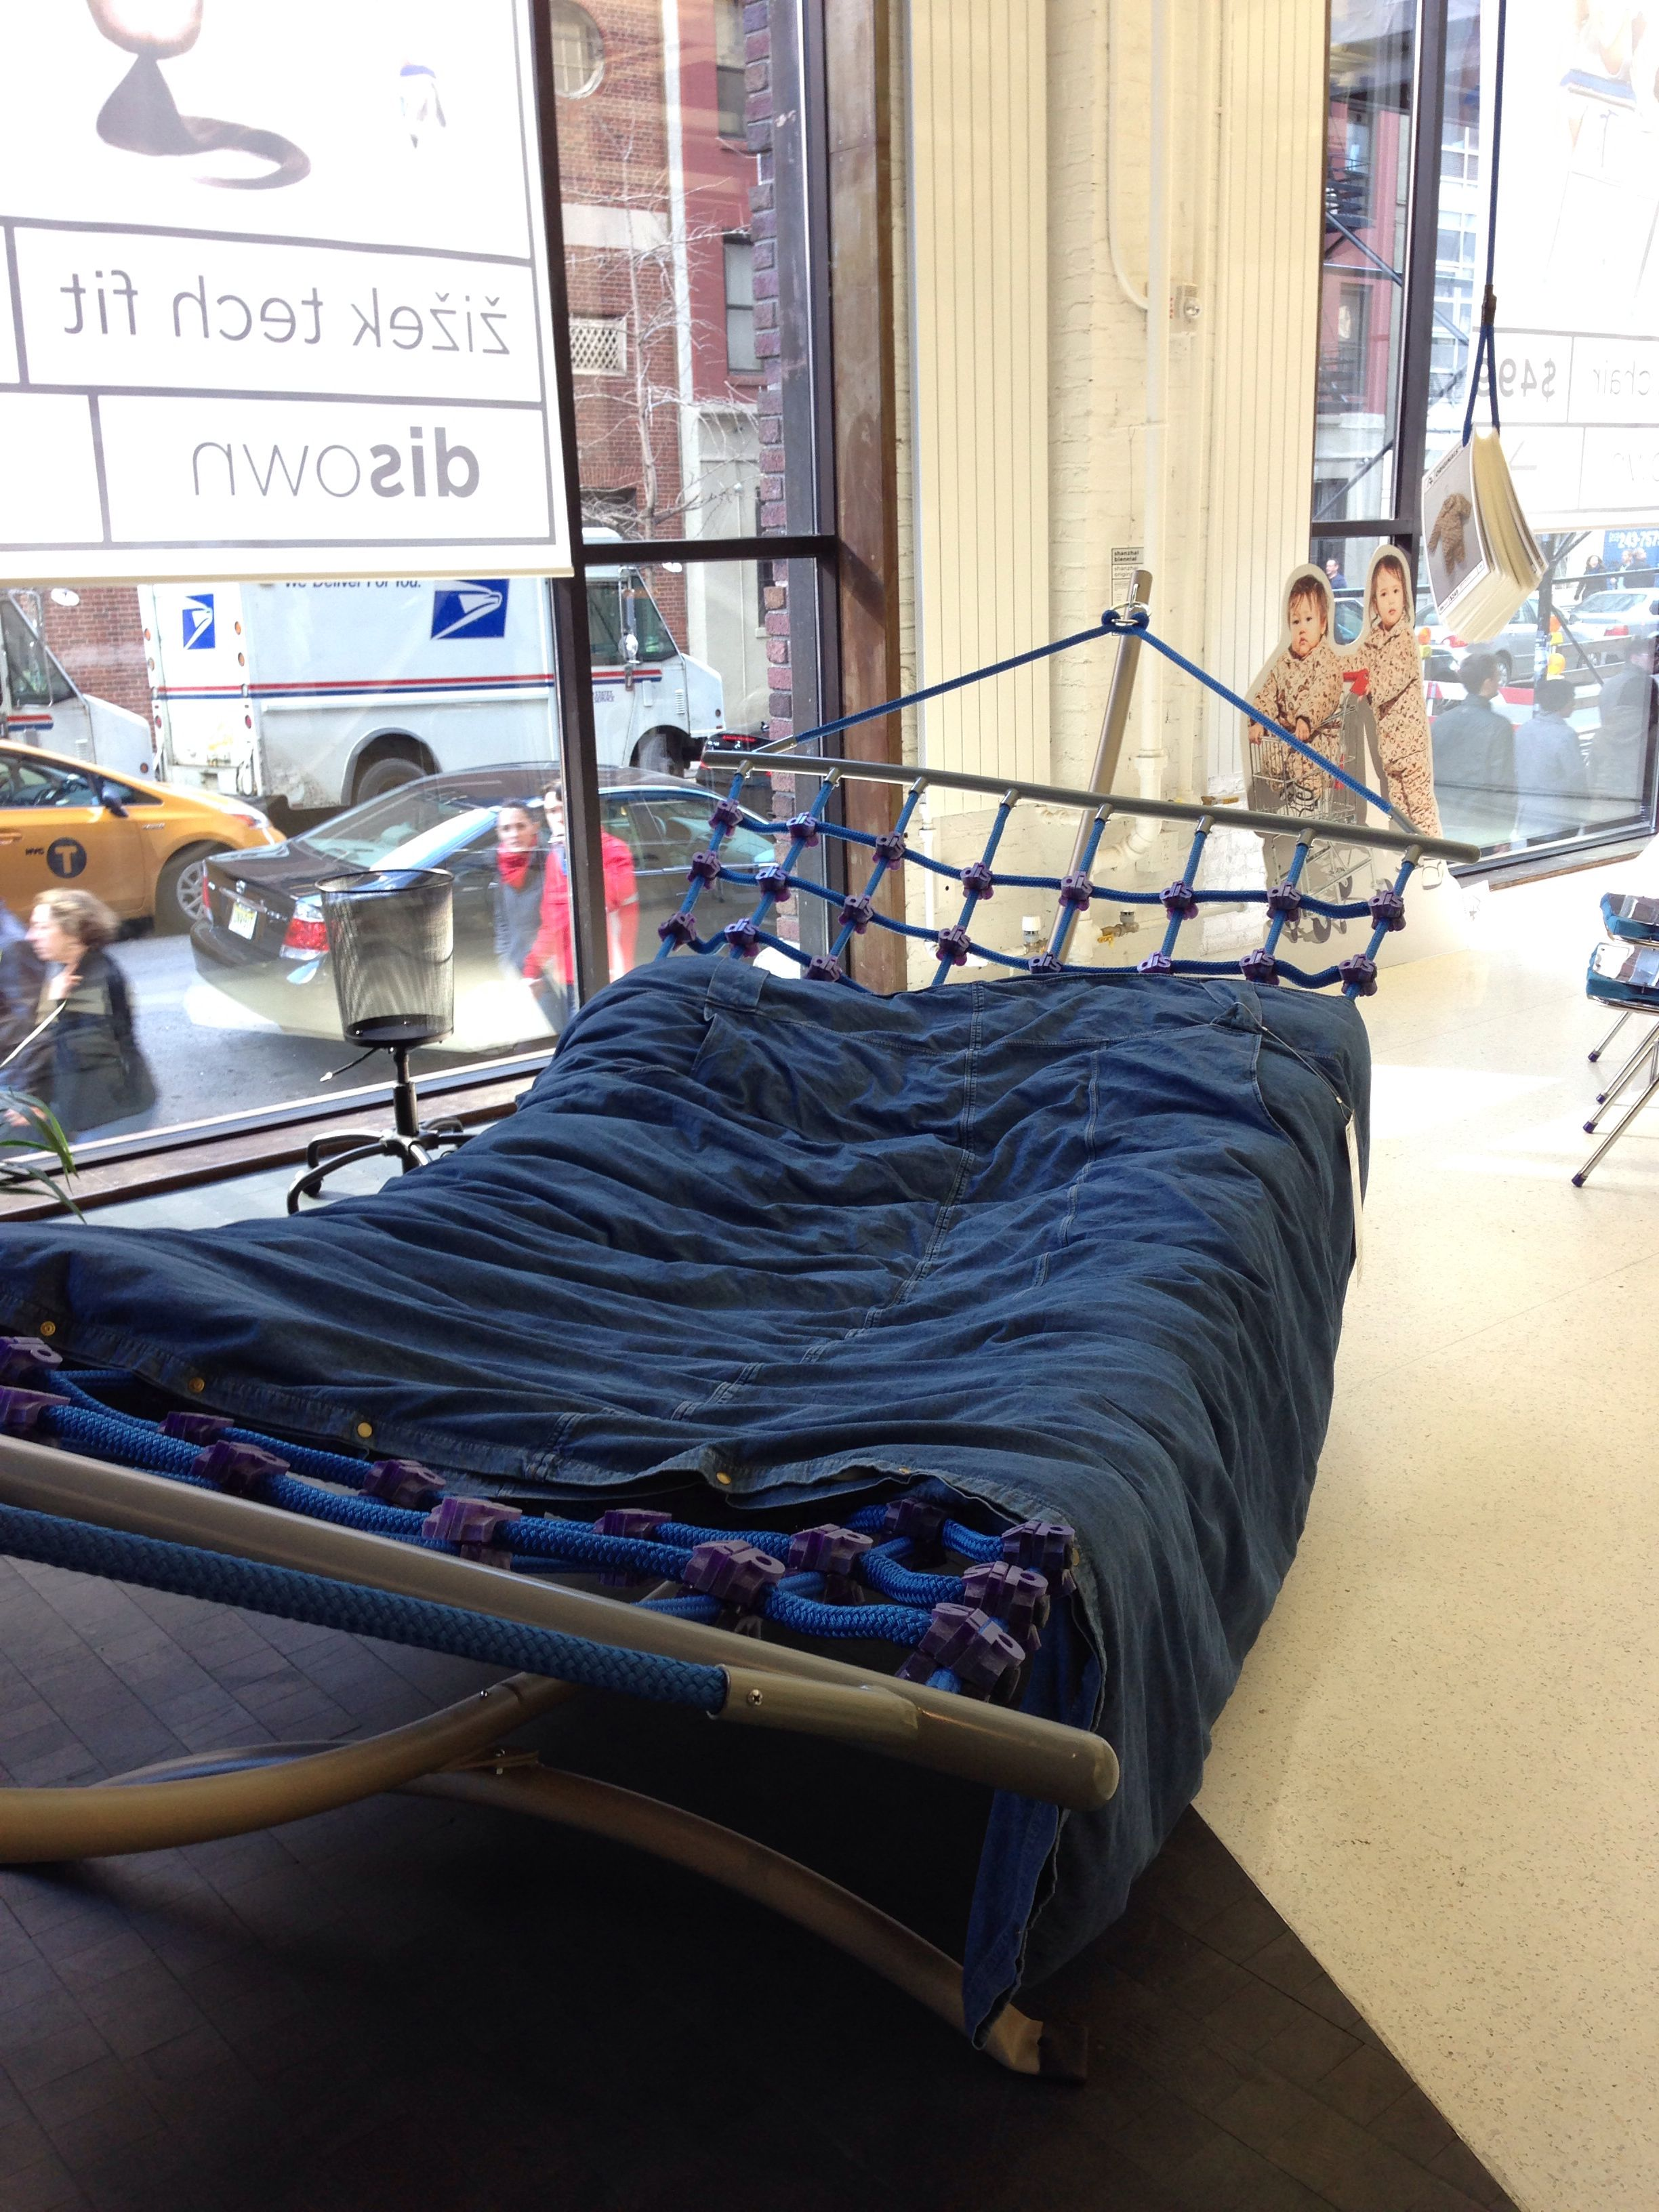 hammock bed yes bedroom pinterest